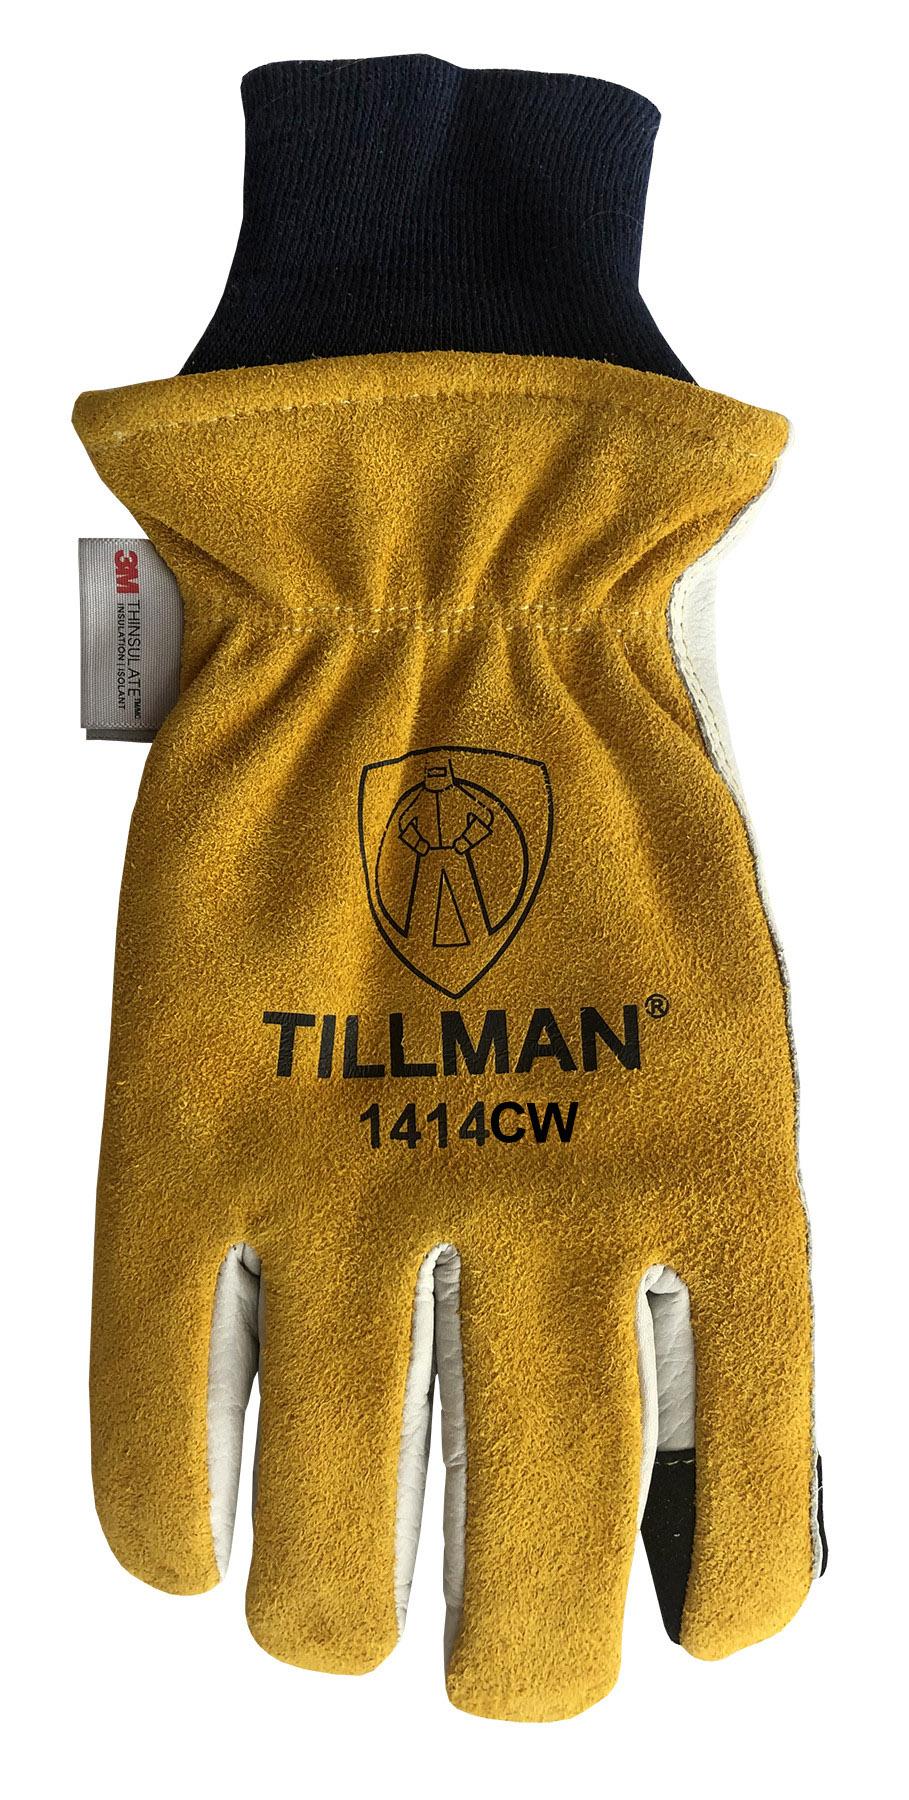 Tillman Til 1414cw 1